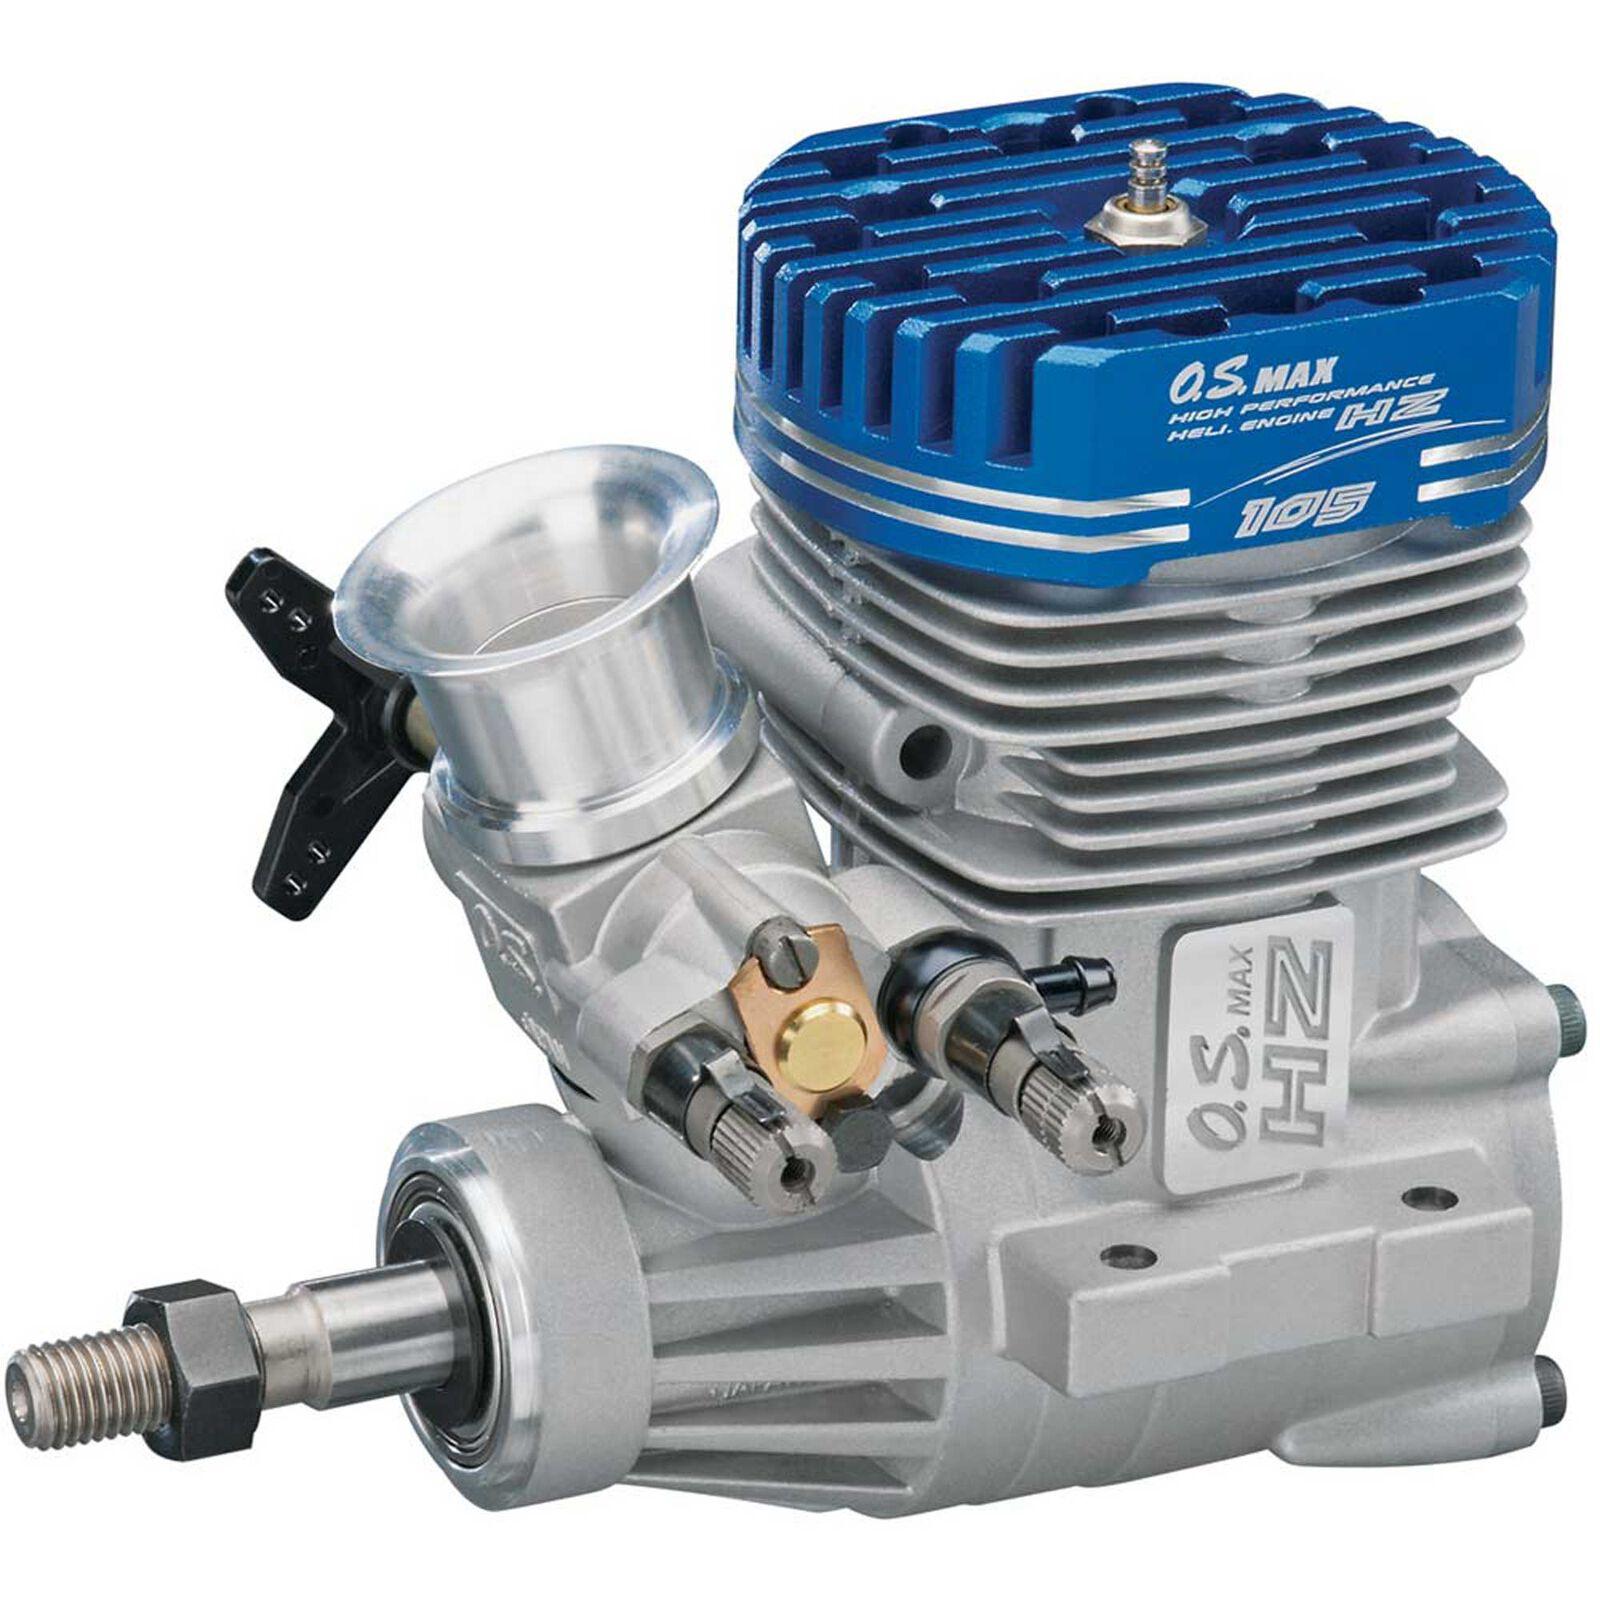 105HZ 1.05 Helicopter Engine